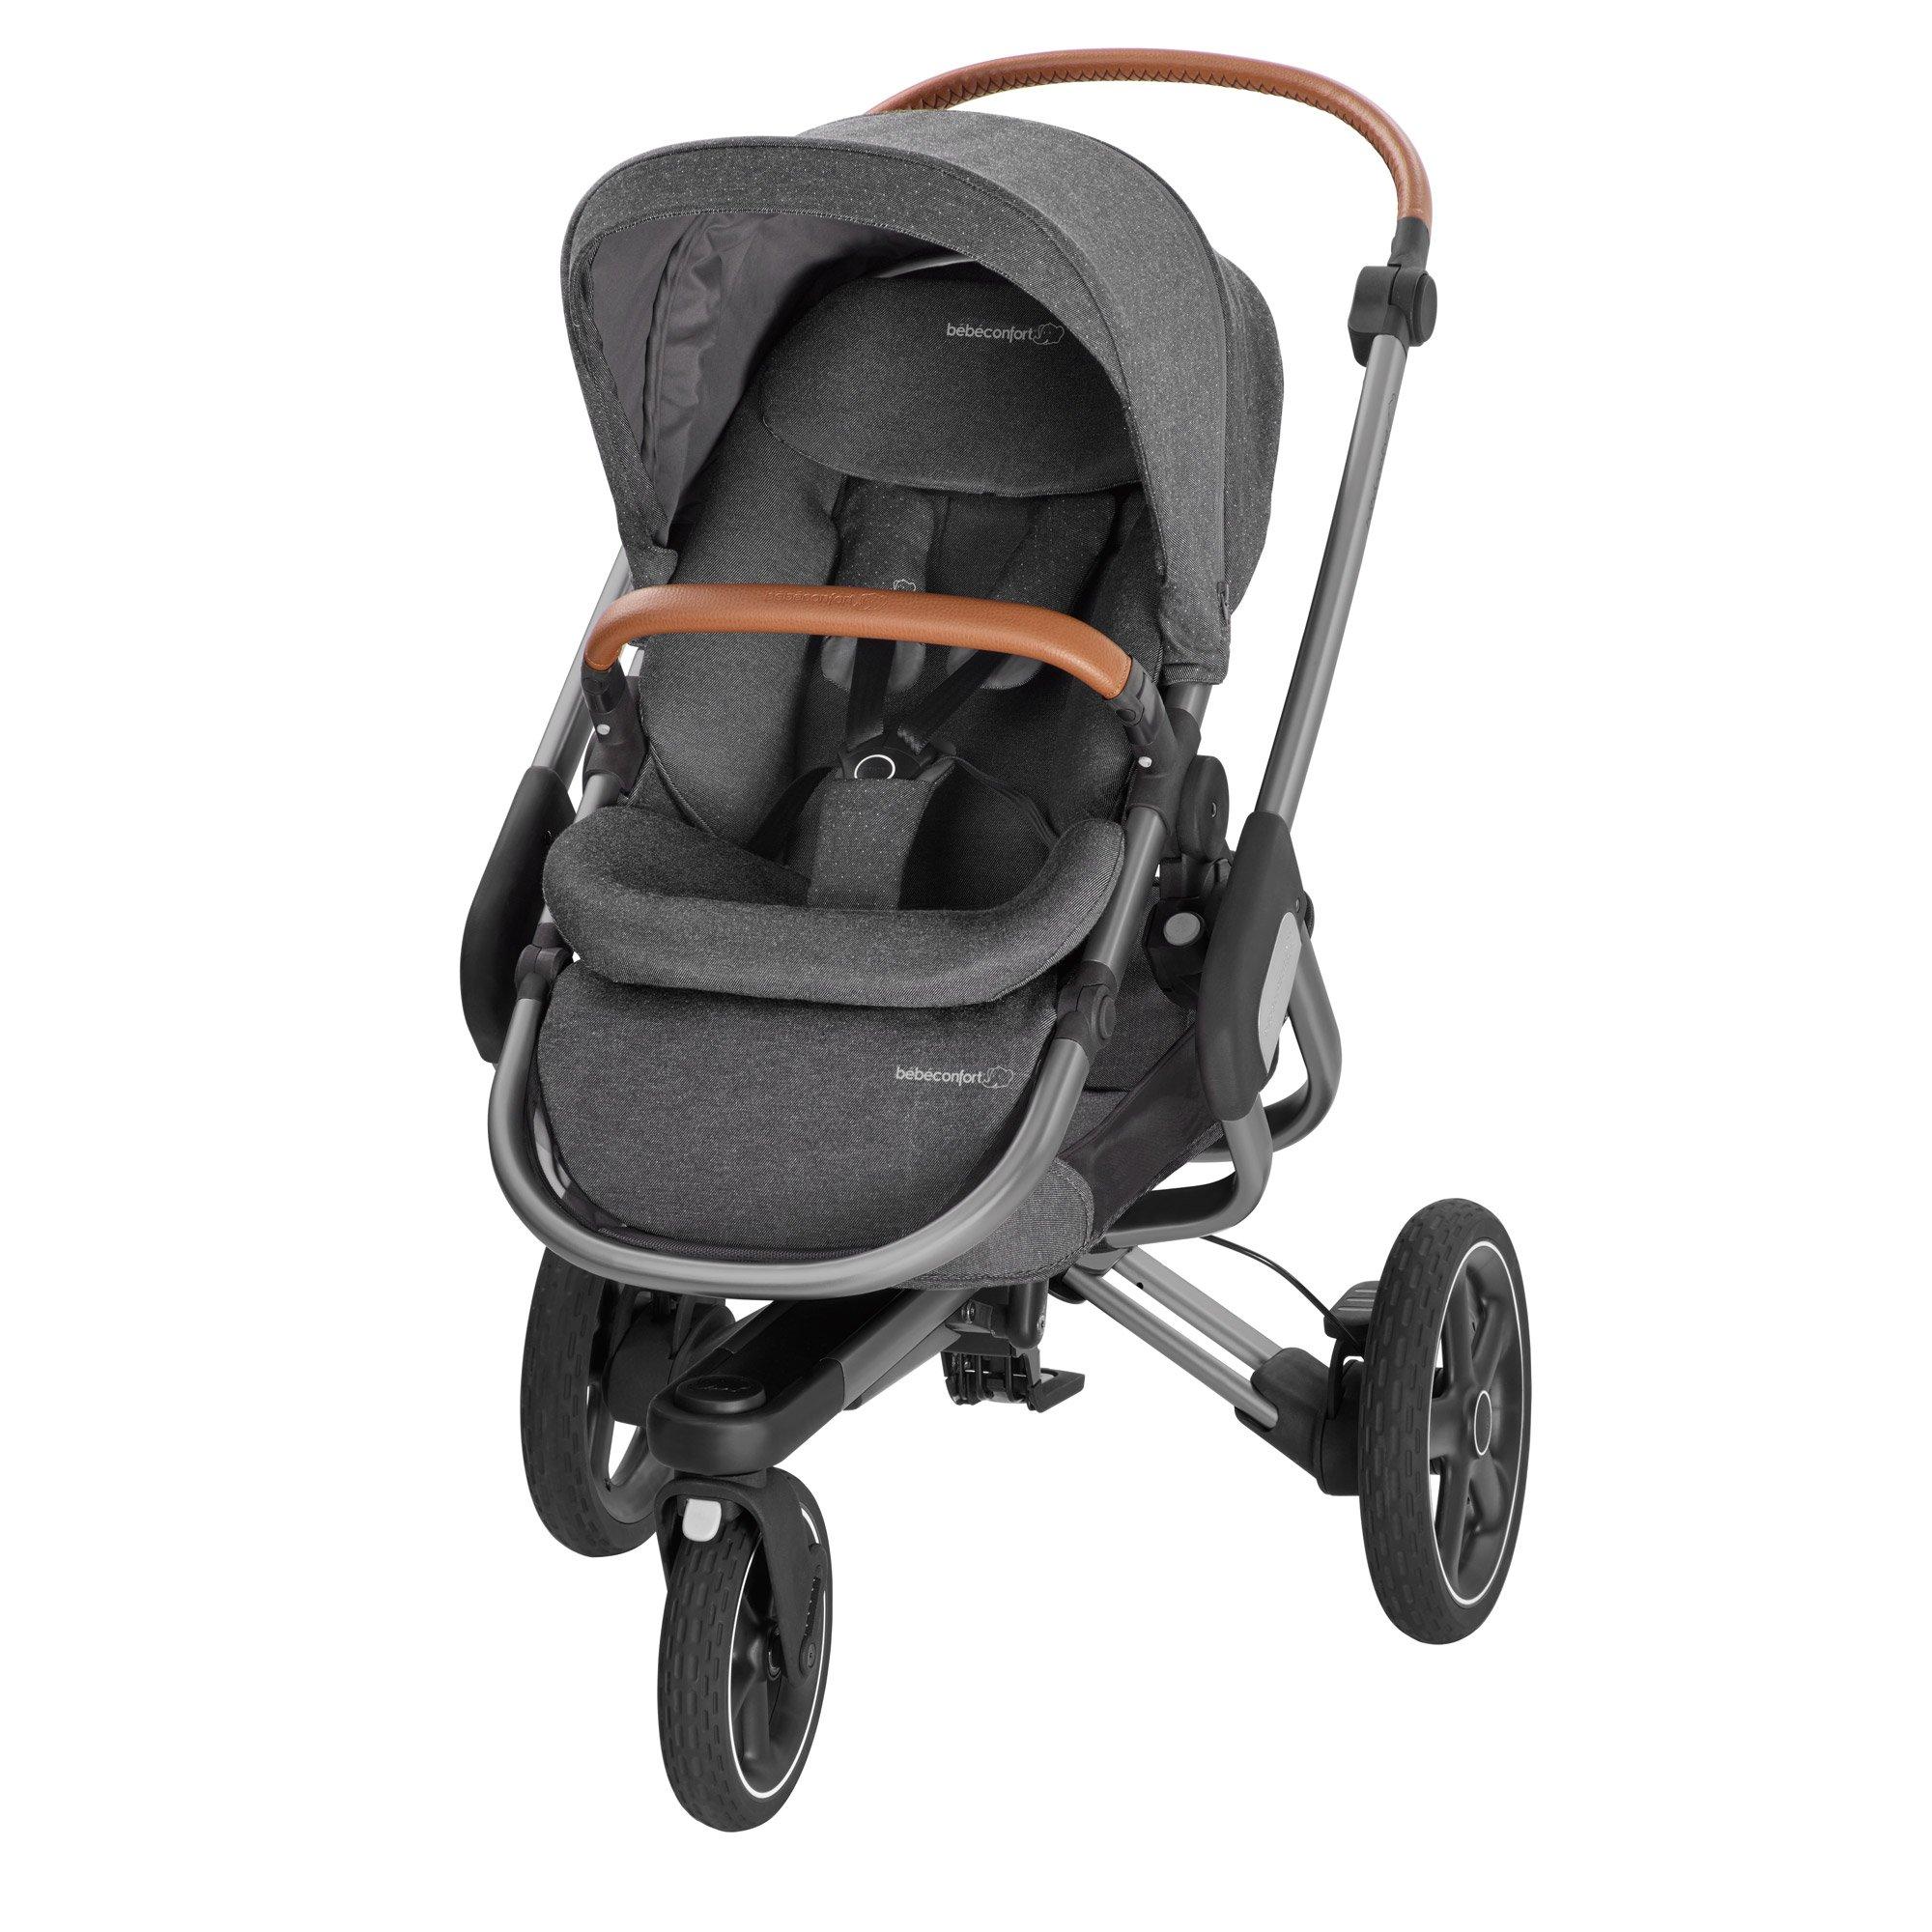 Nova 3 roues Sparkling Grey de Bébé Confort,